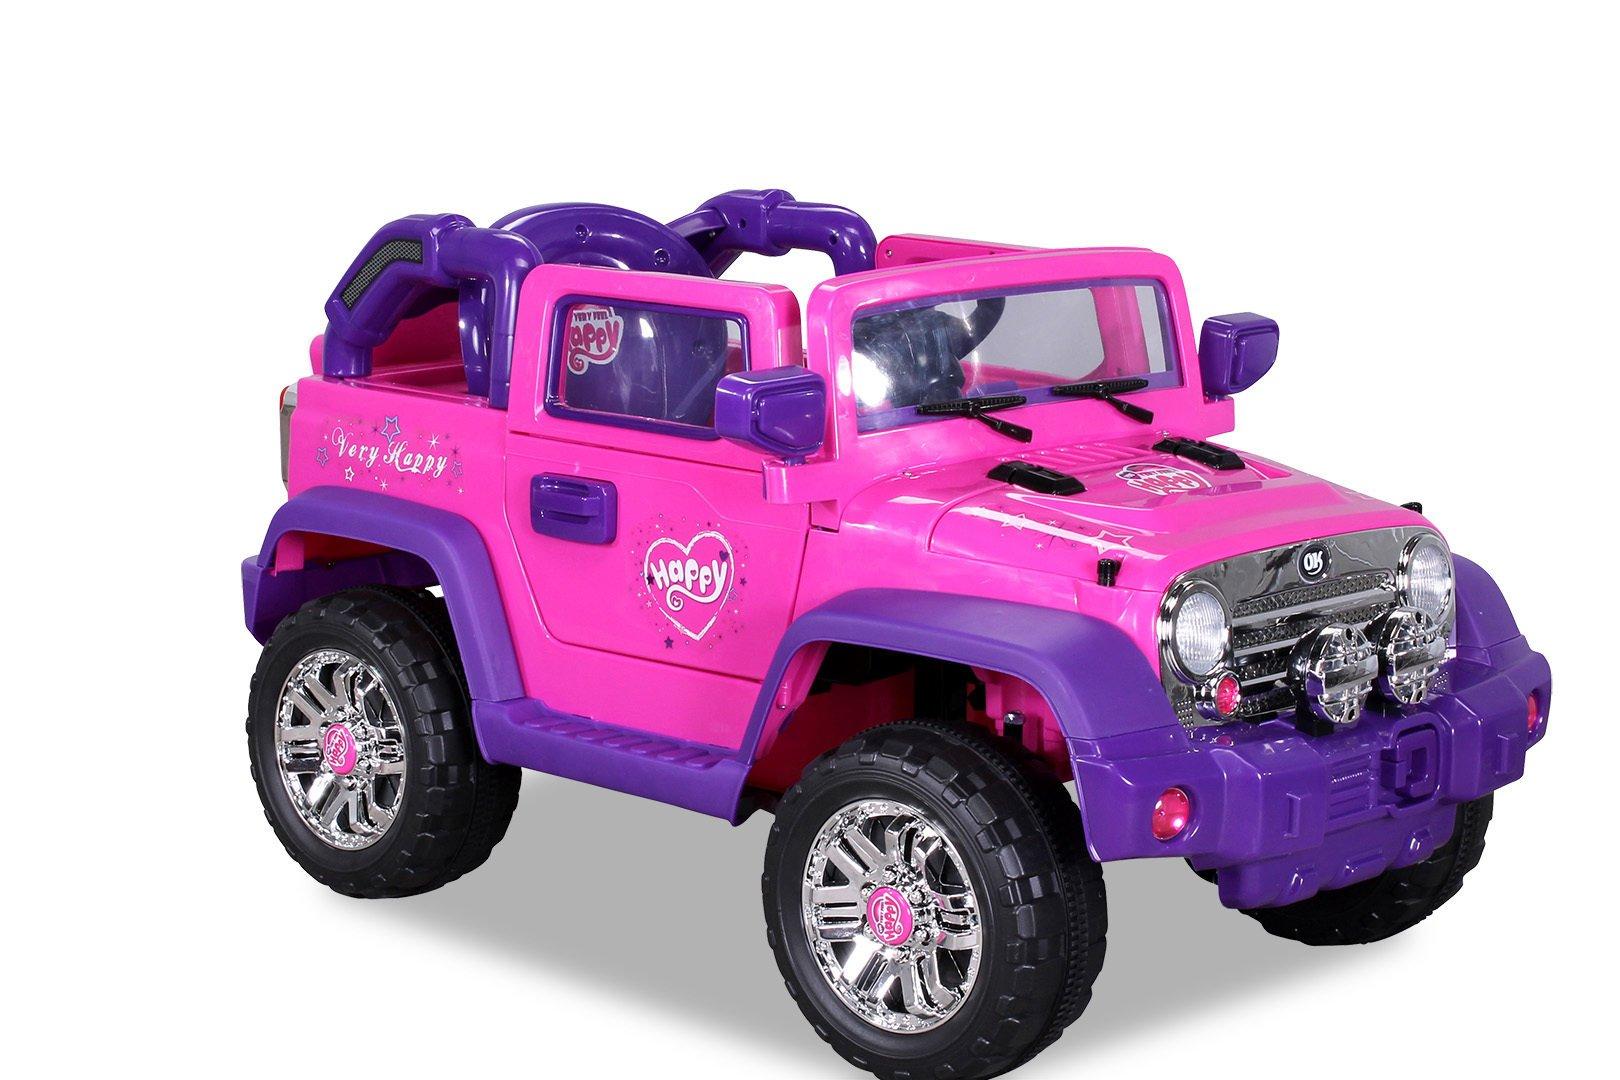 Coche electrico infantil Jeep Wrangler Style Rosa asiento acolchado en piel